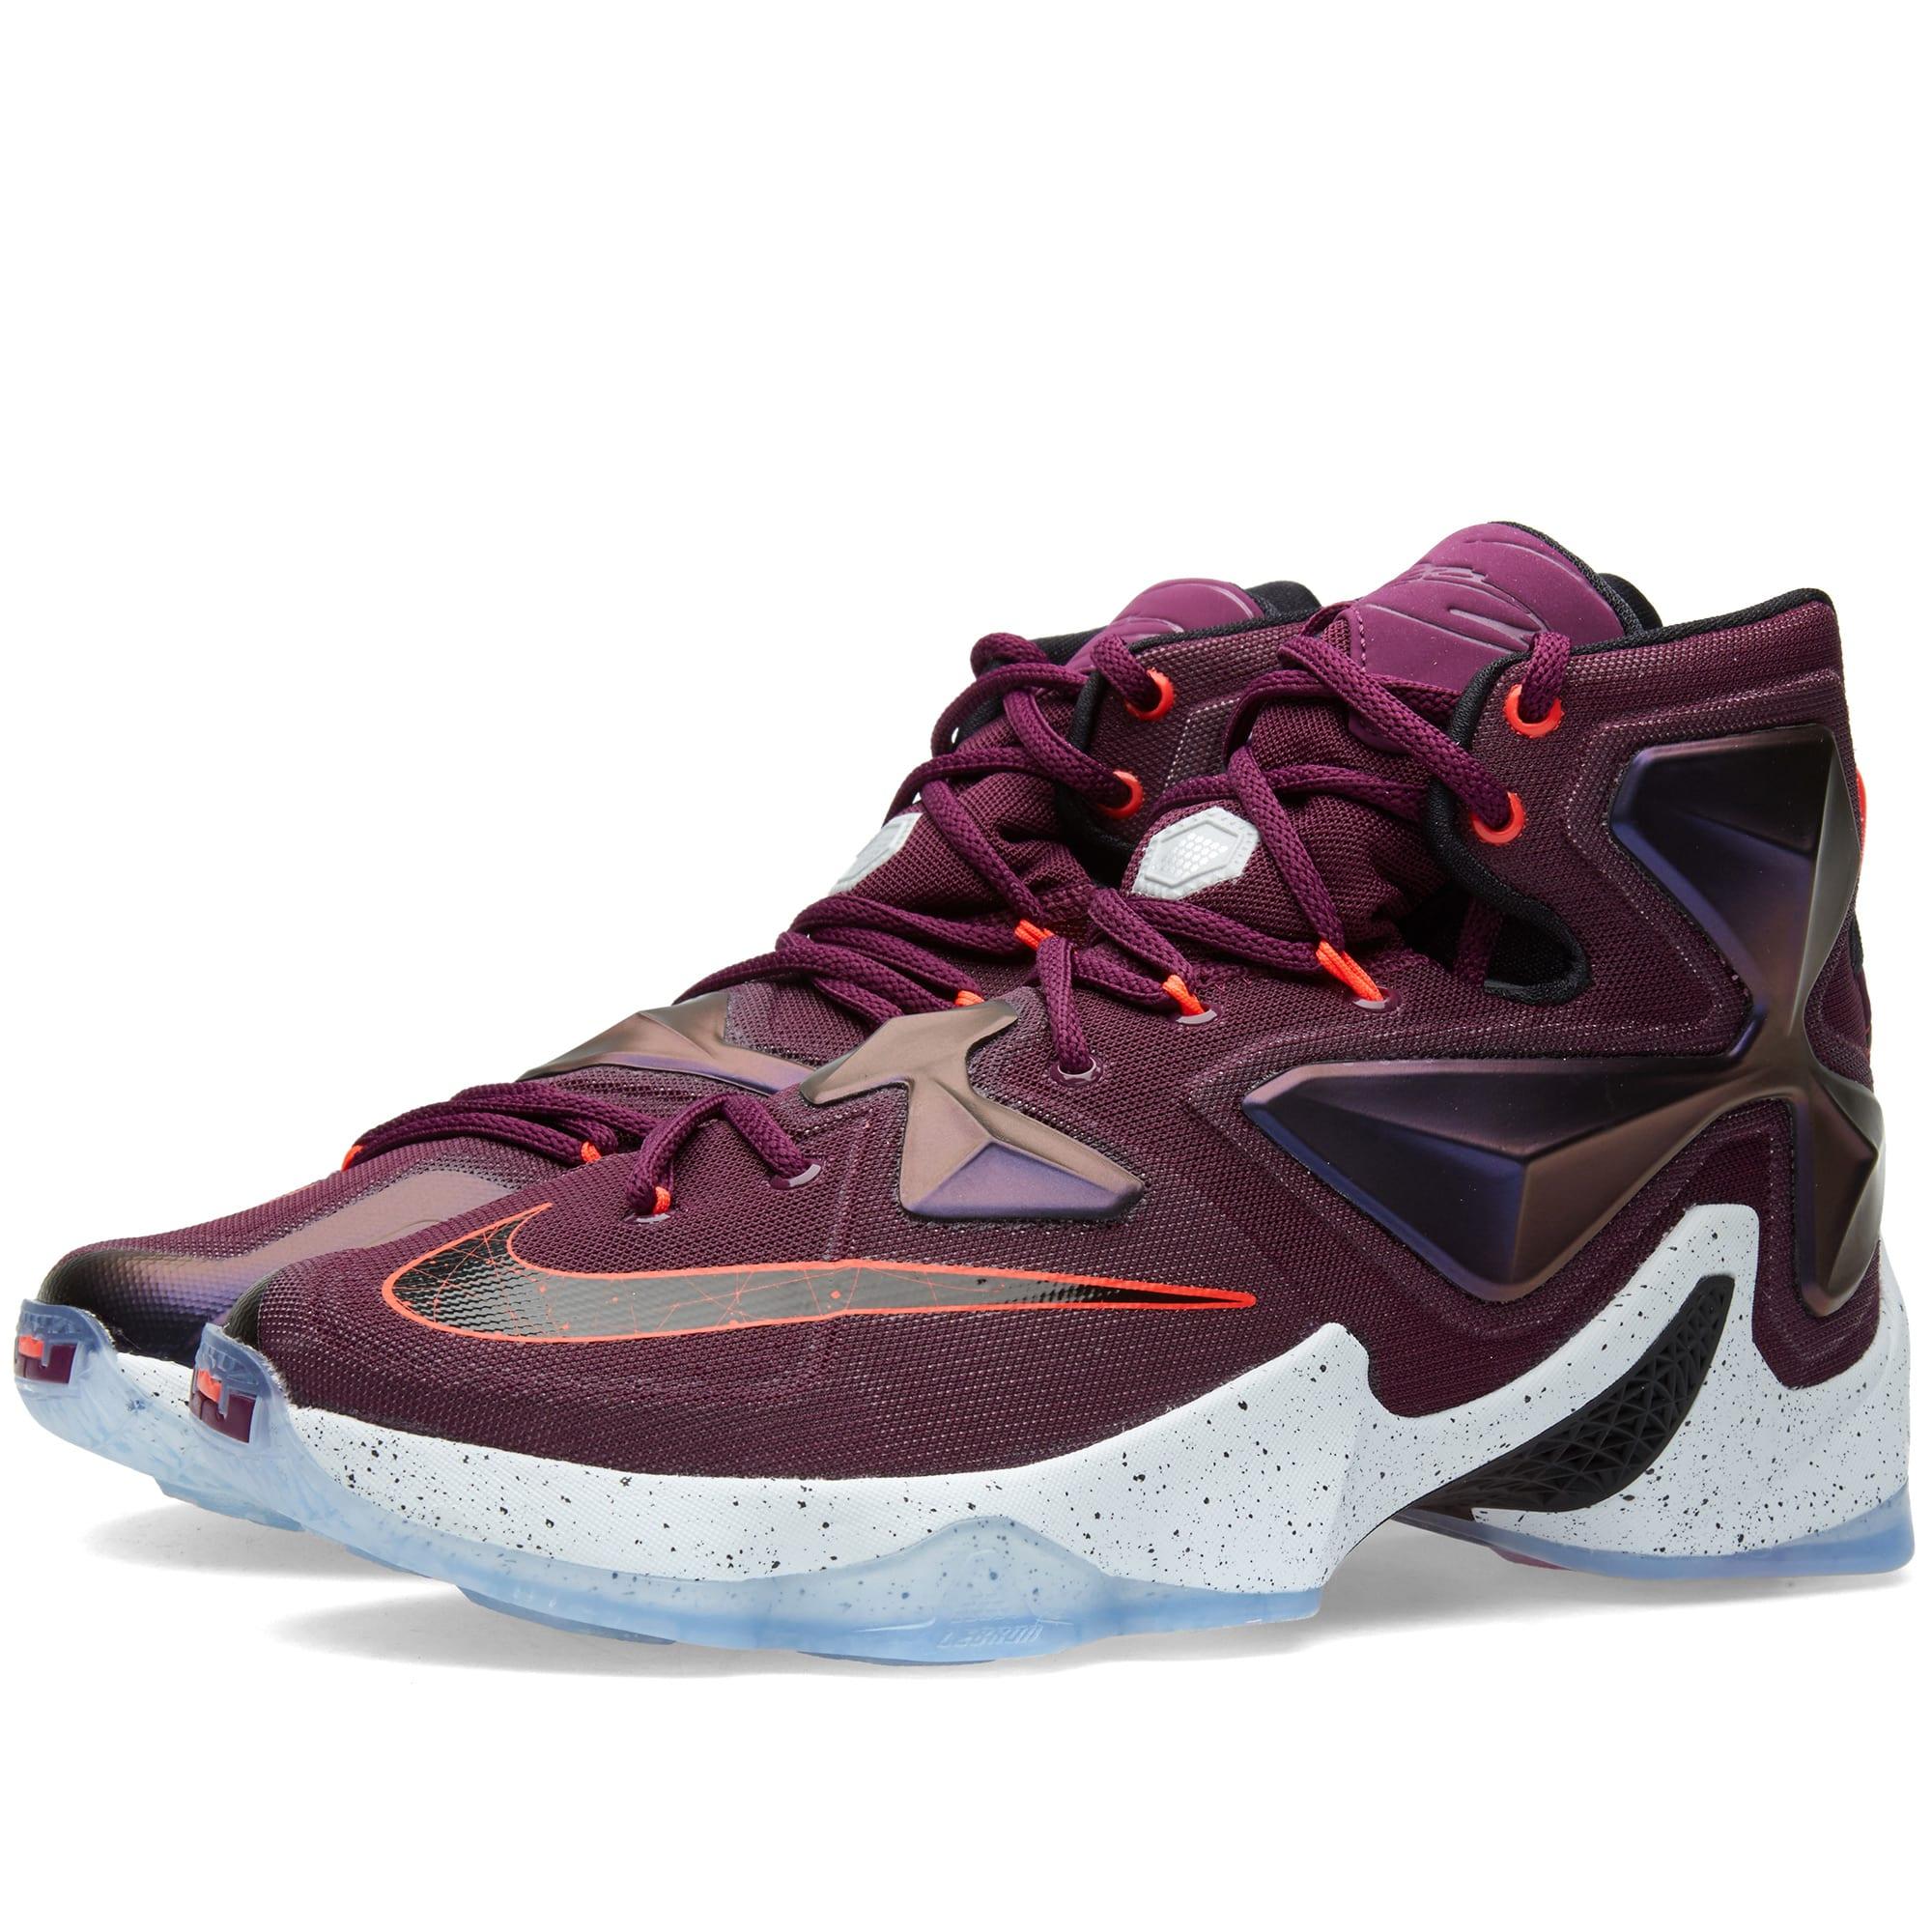 2e12771470d6 Nike LeBron 13 Written in the Stars Mulberry